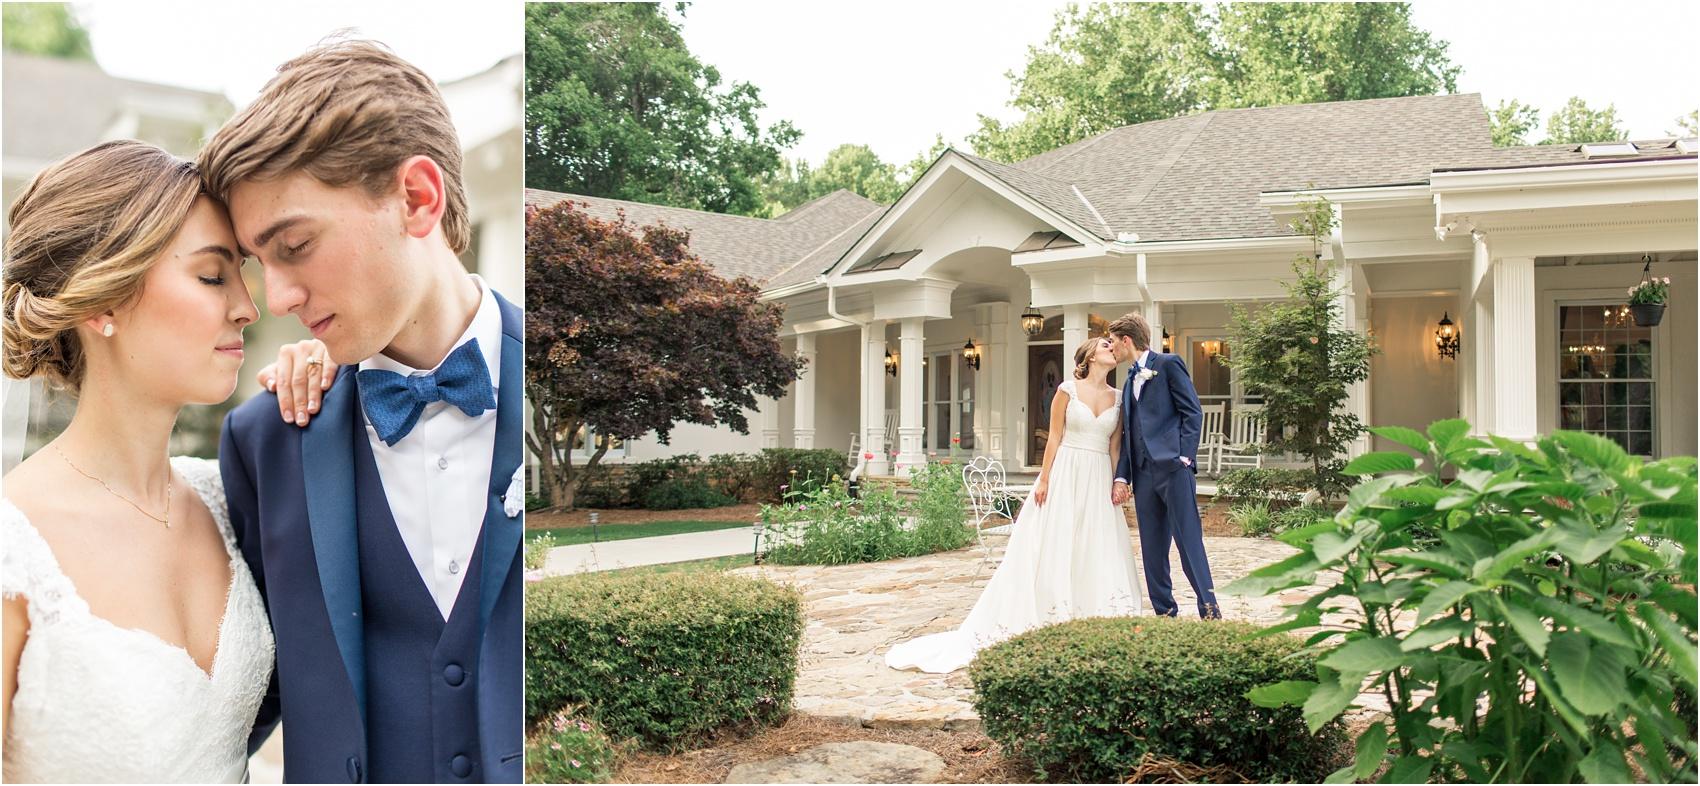 Savannah Eve Photography- Sigl-Adams Wedding- Sneak Peek-58.jpg